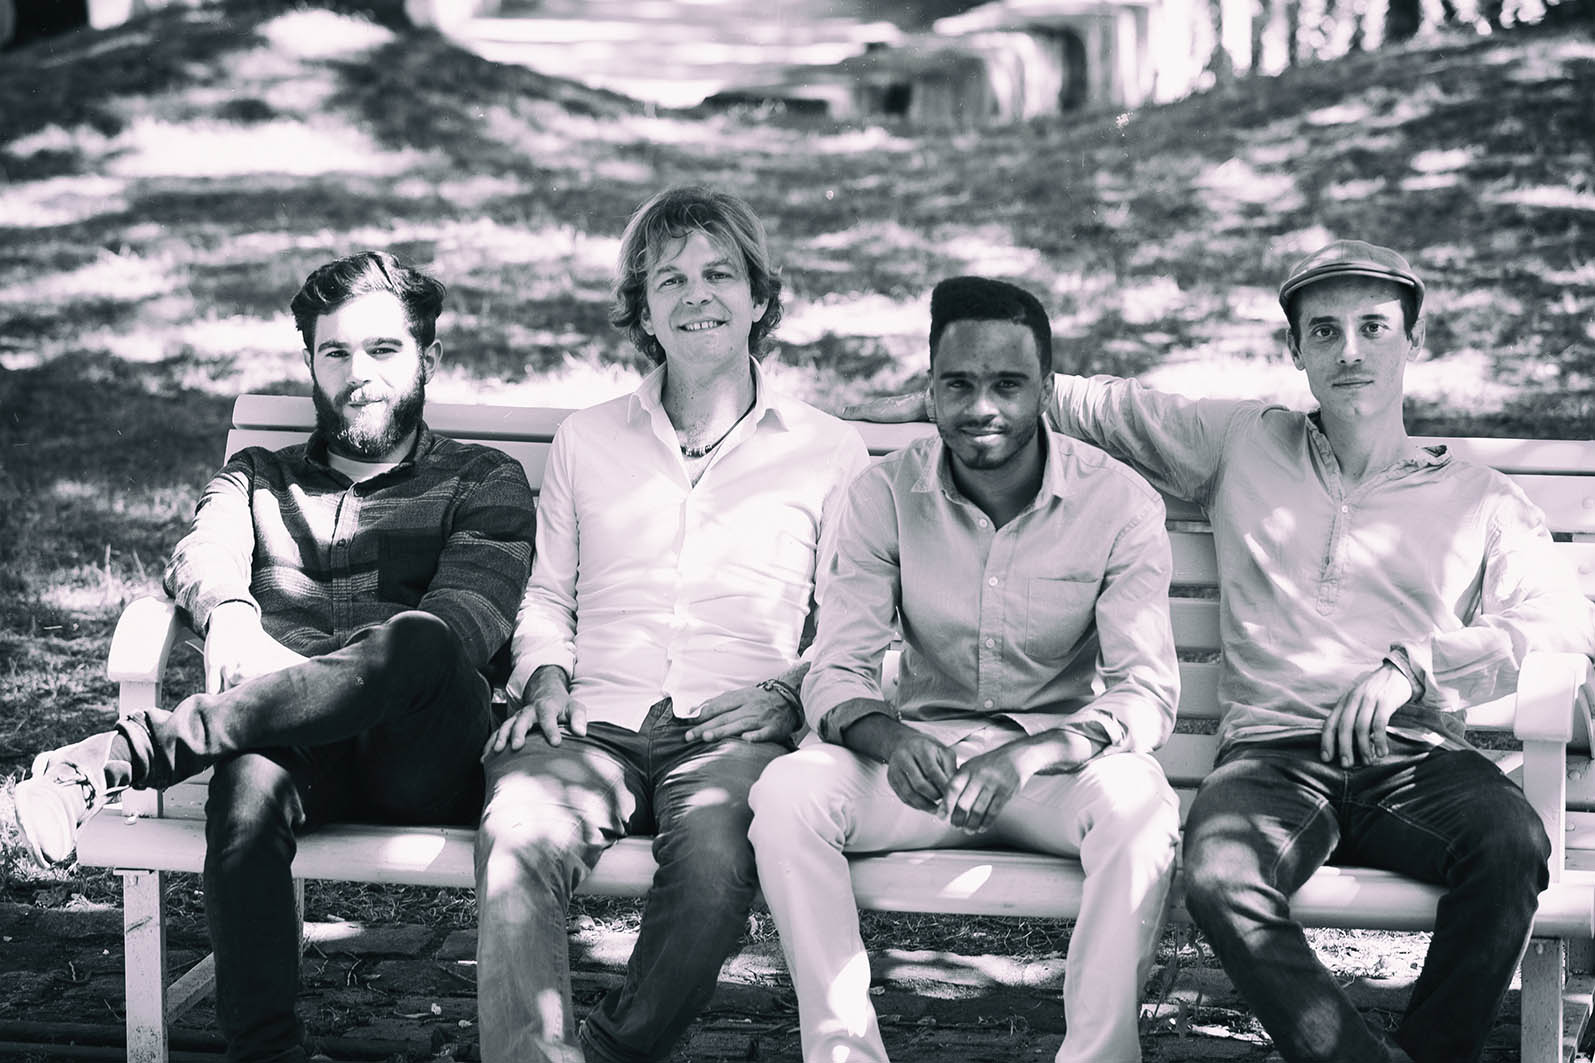 Arnaud Dolmen Quartet Show, 16/10/16 at Caf'Muz